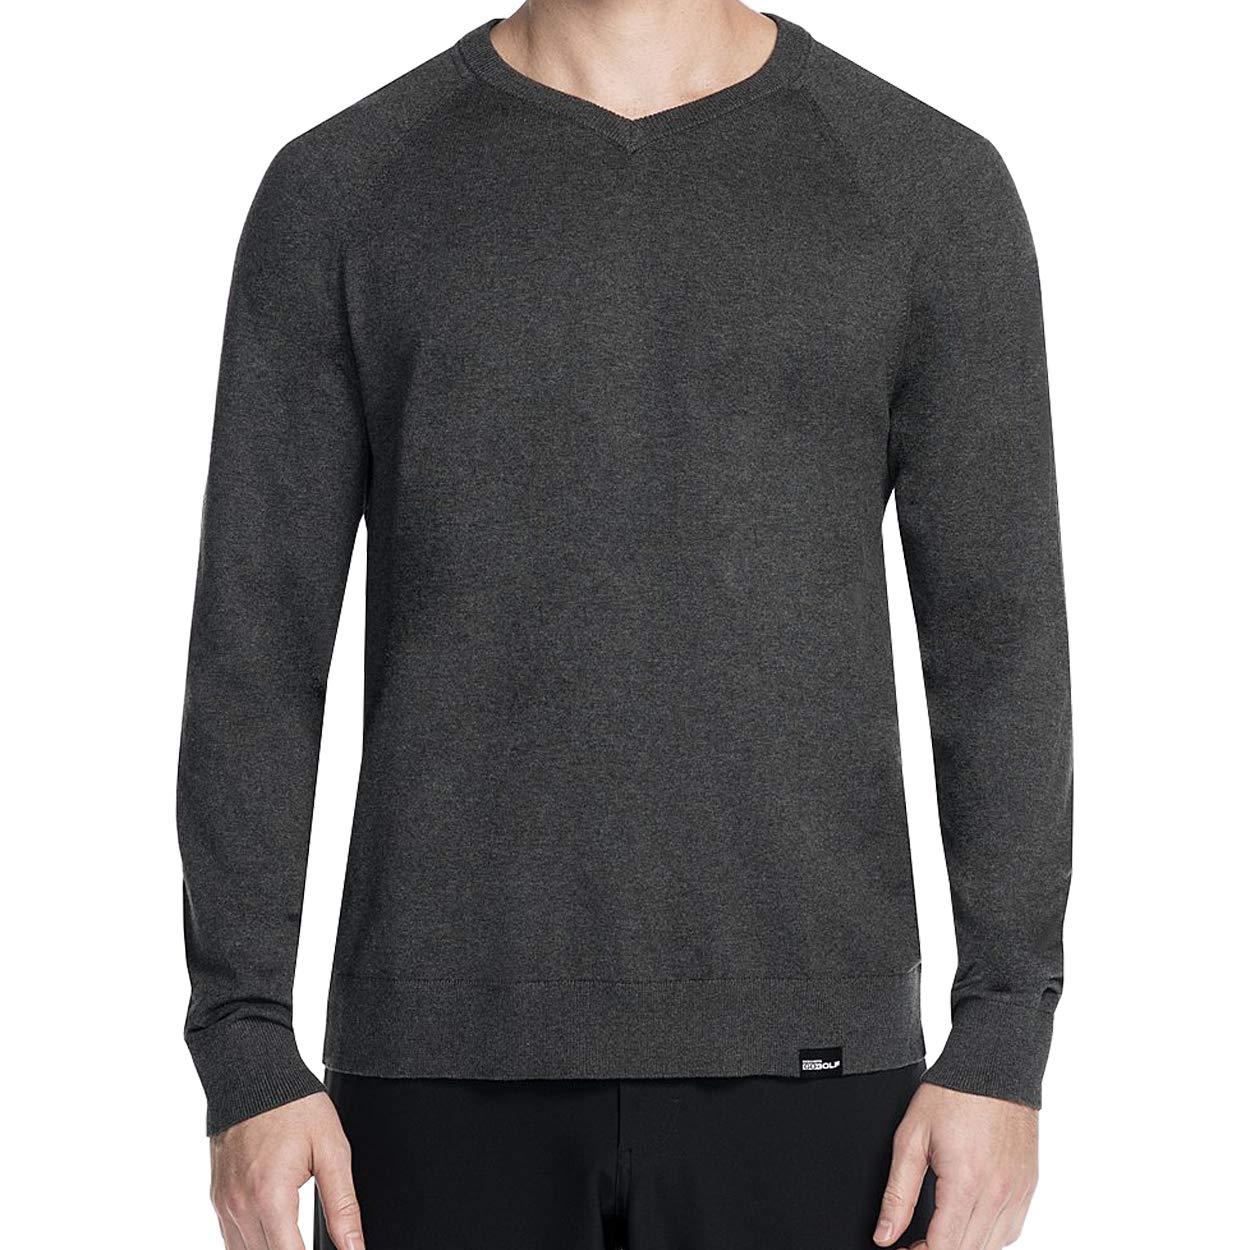 Skechers Golf Men's Fairway Long Sleeve V Neck Cottom Cashmere Sweater Vest, heather charcoal, XXL by Skechers